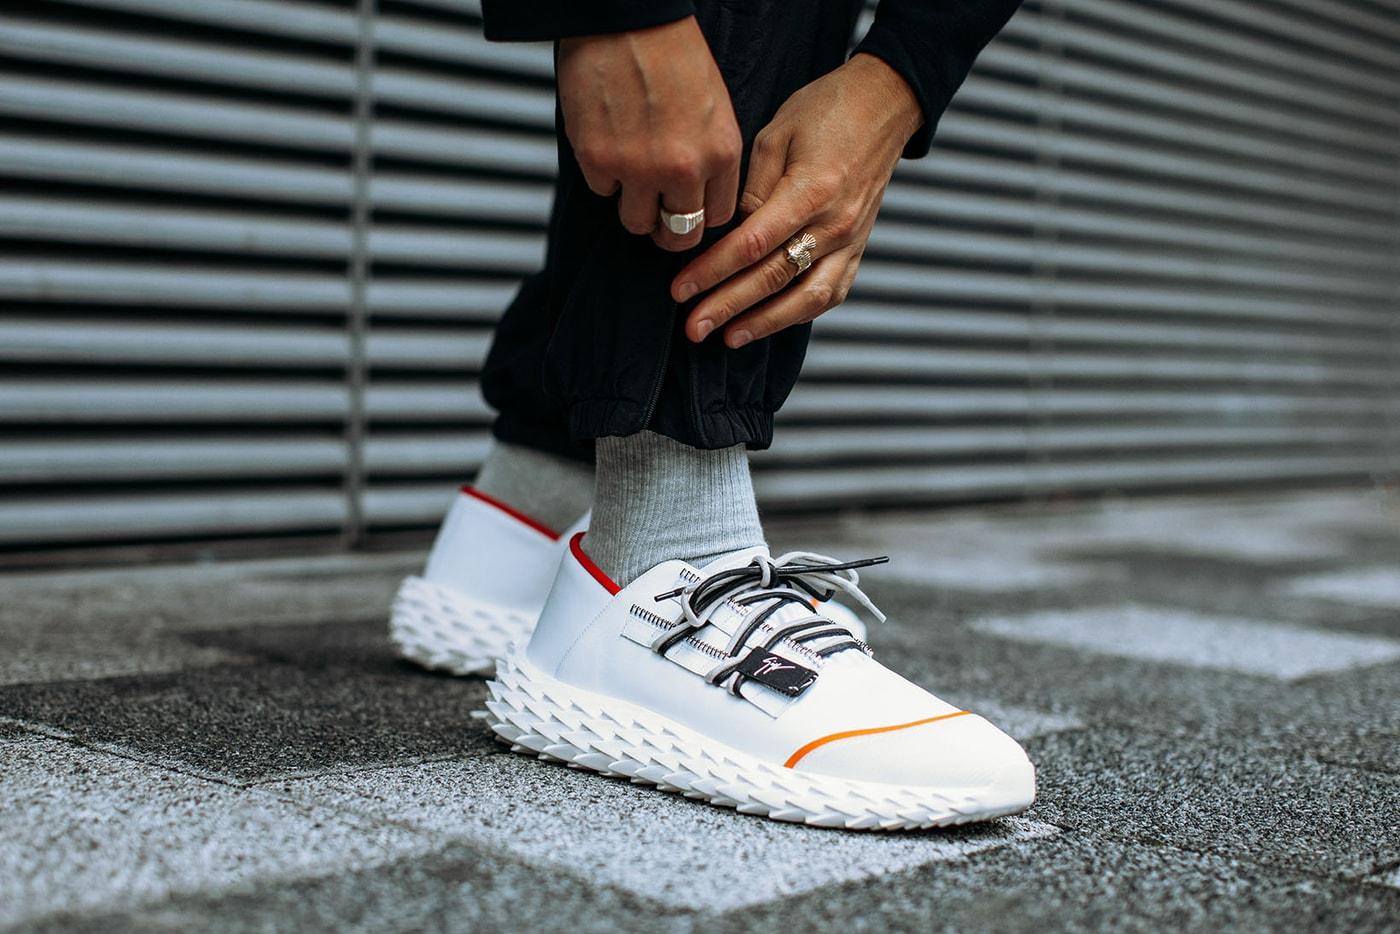 Giuseppe Zanotti Urchin Sneaker Release 2018 Black White ... b24d71f11